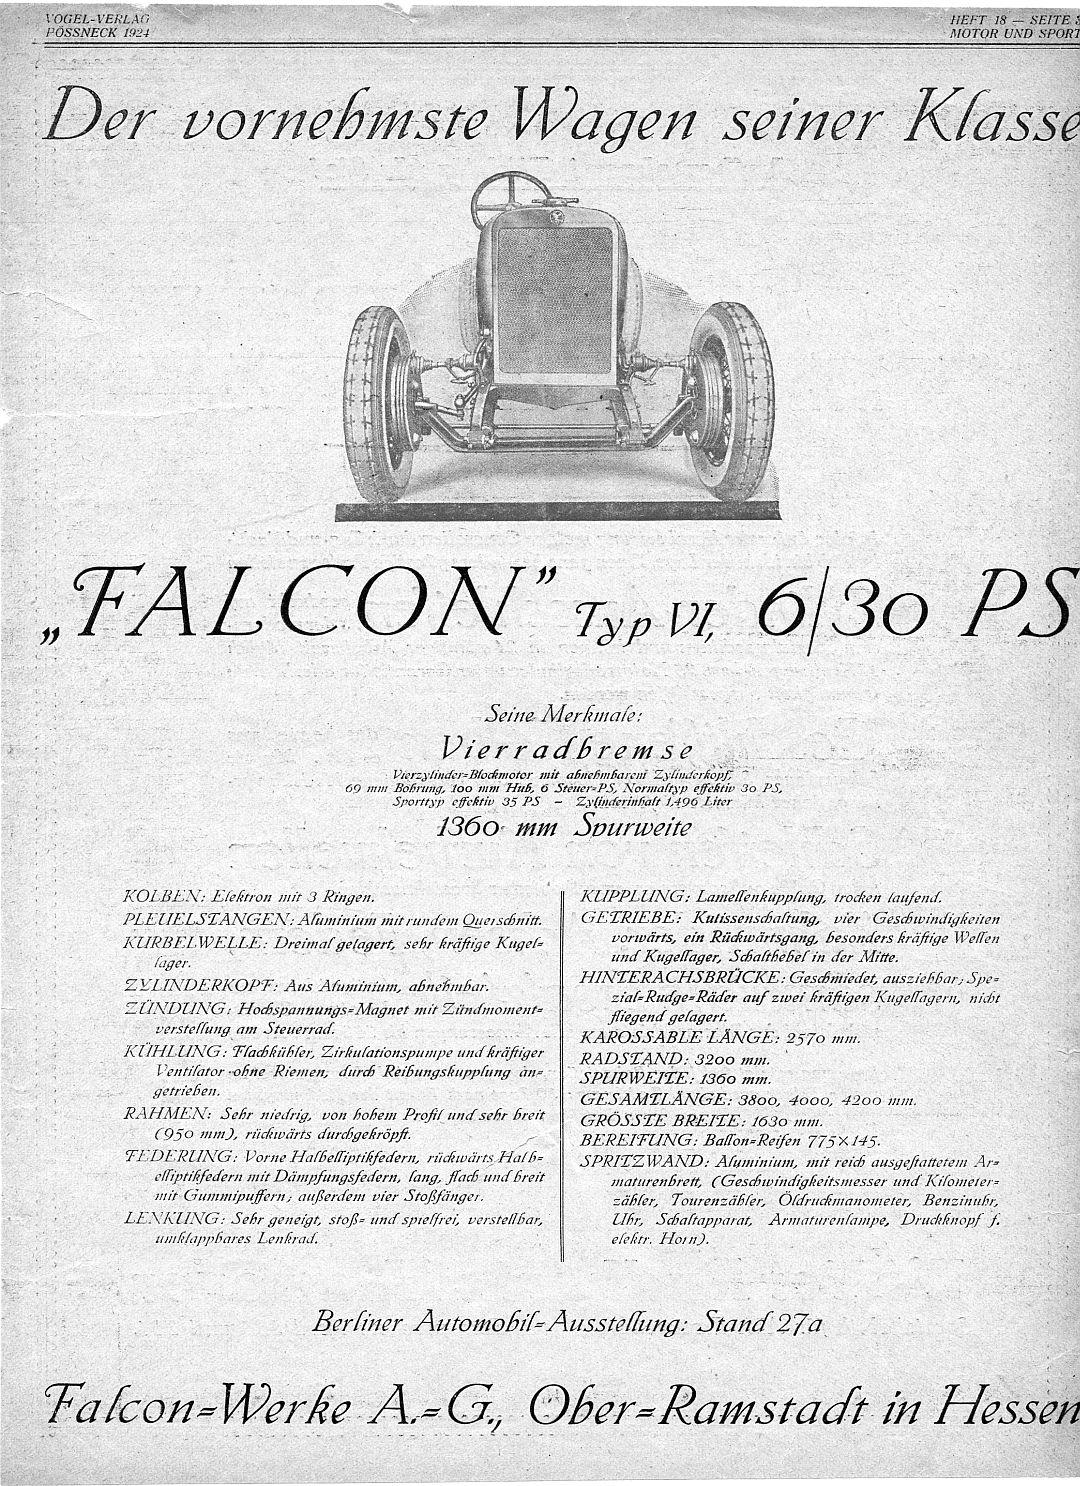 Falcon_TypVI_6-30_PS_Motor_und_Sport_Heft_18_1924_Galerie